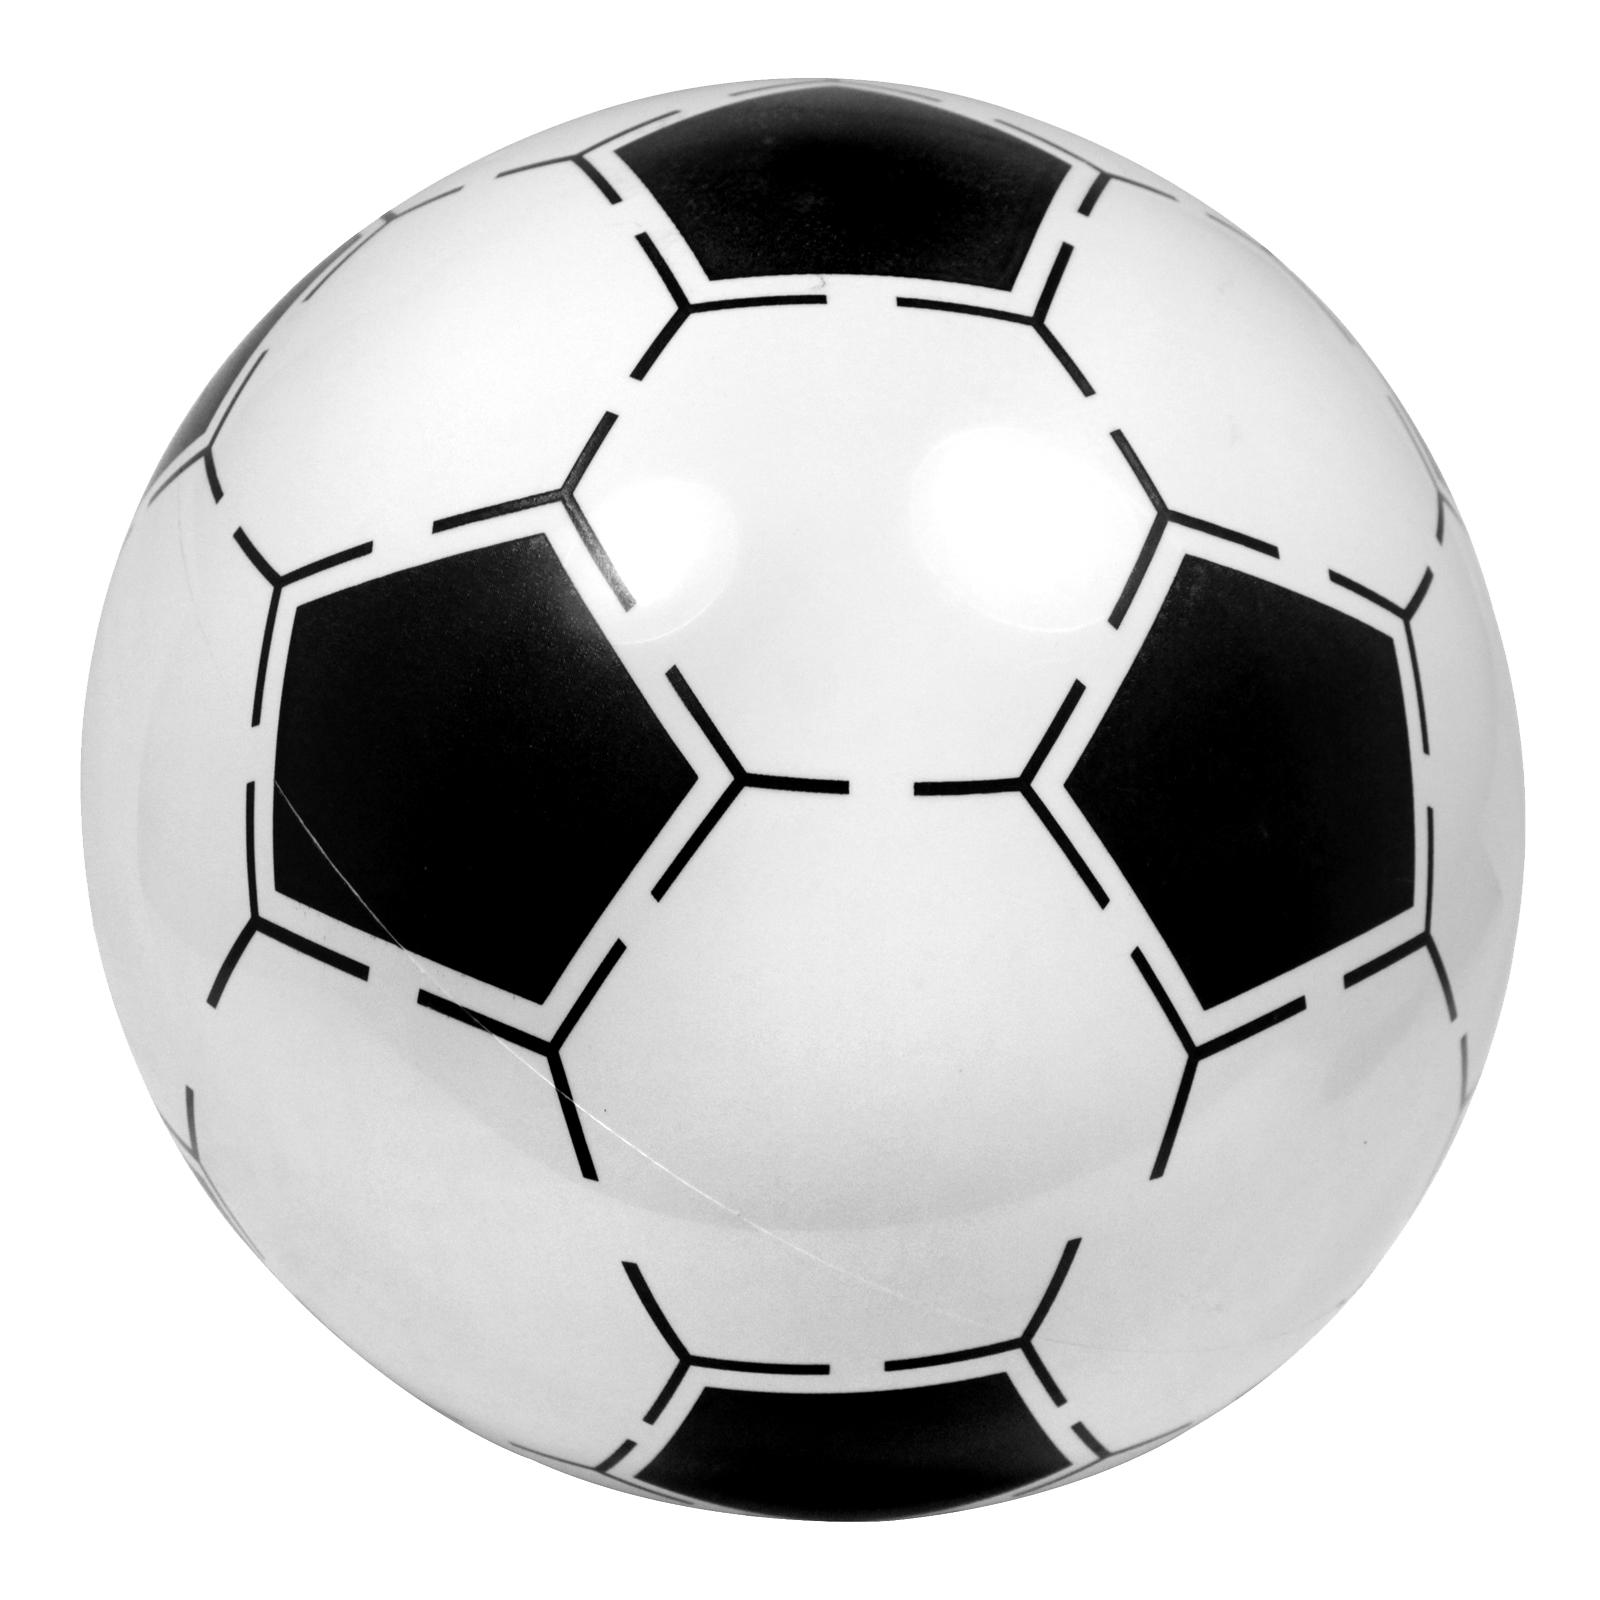 FOOTBALL - MUNDIAL 8